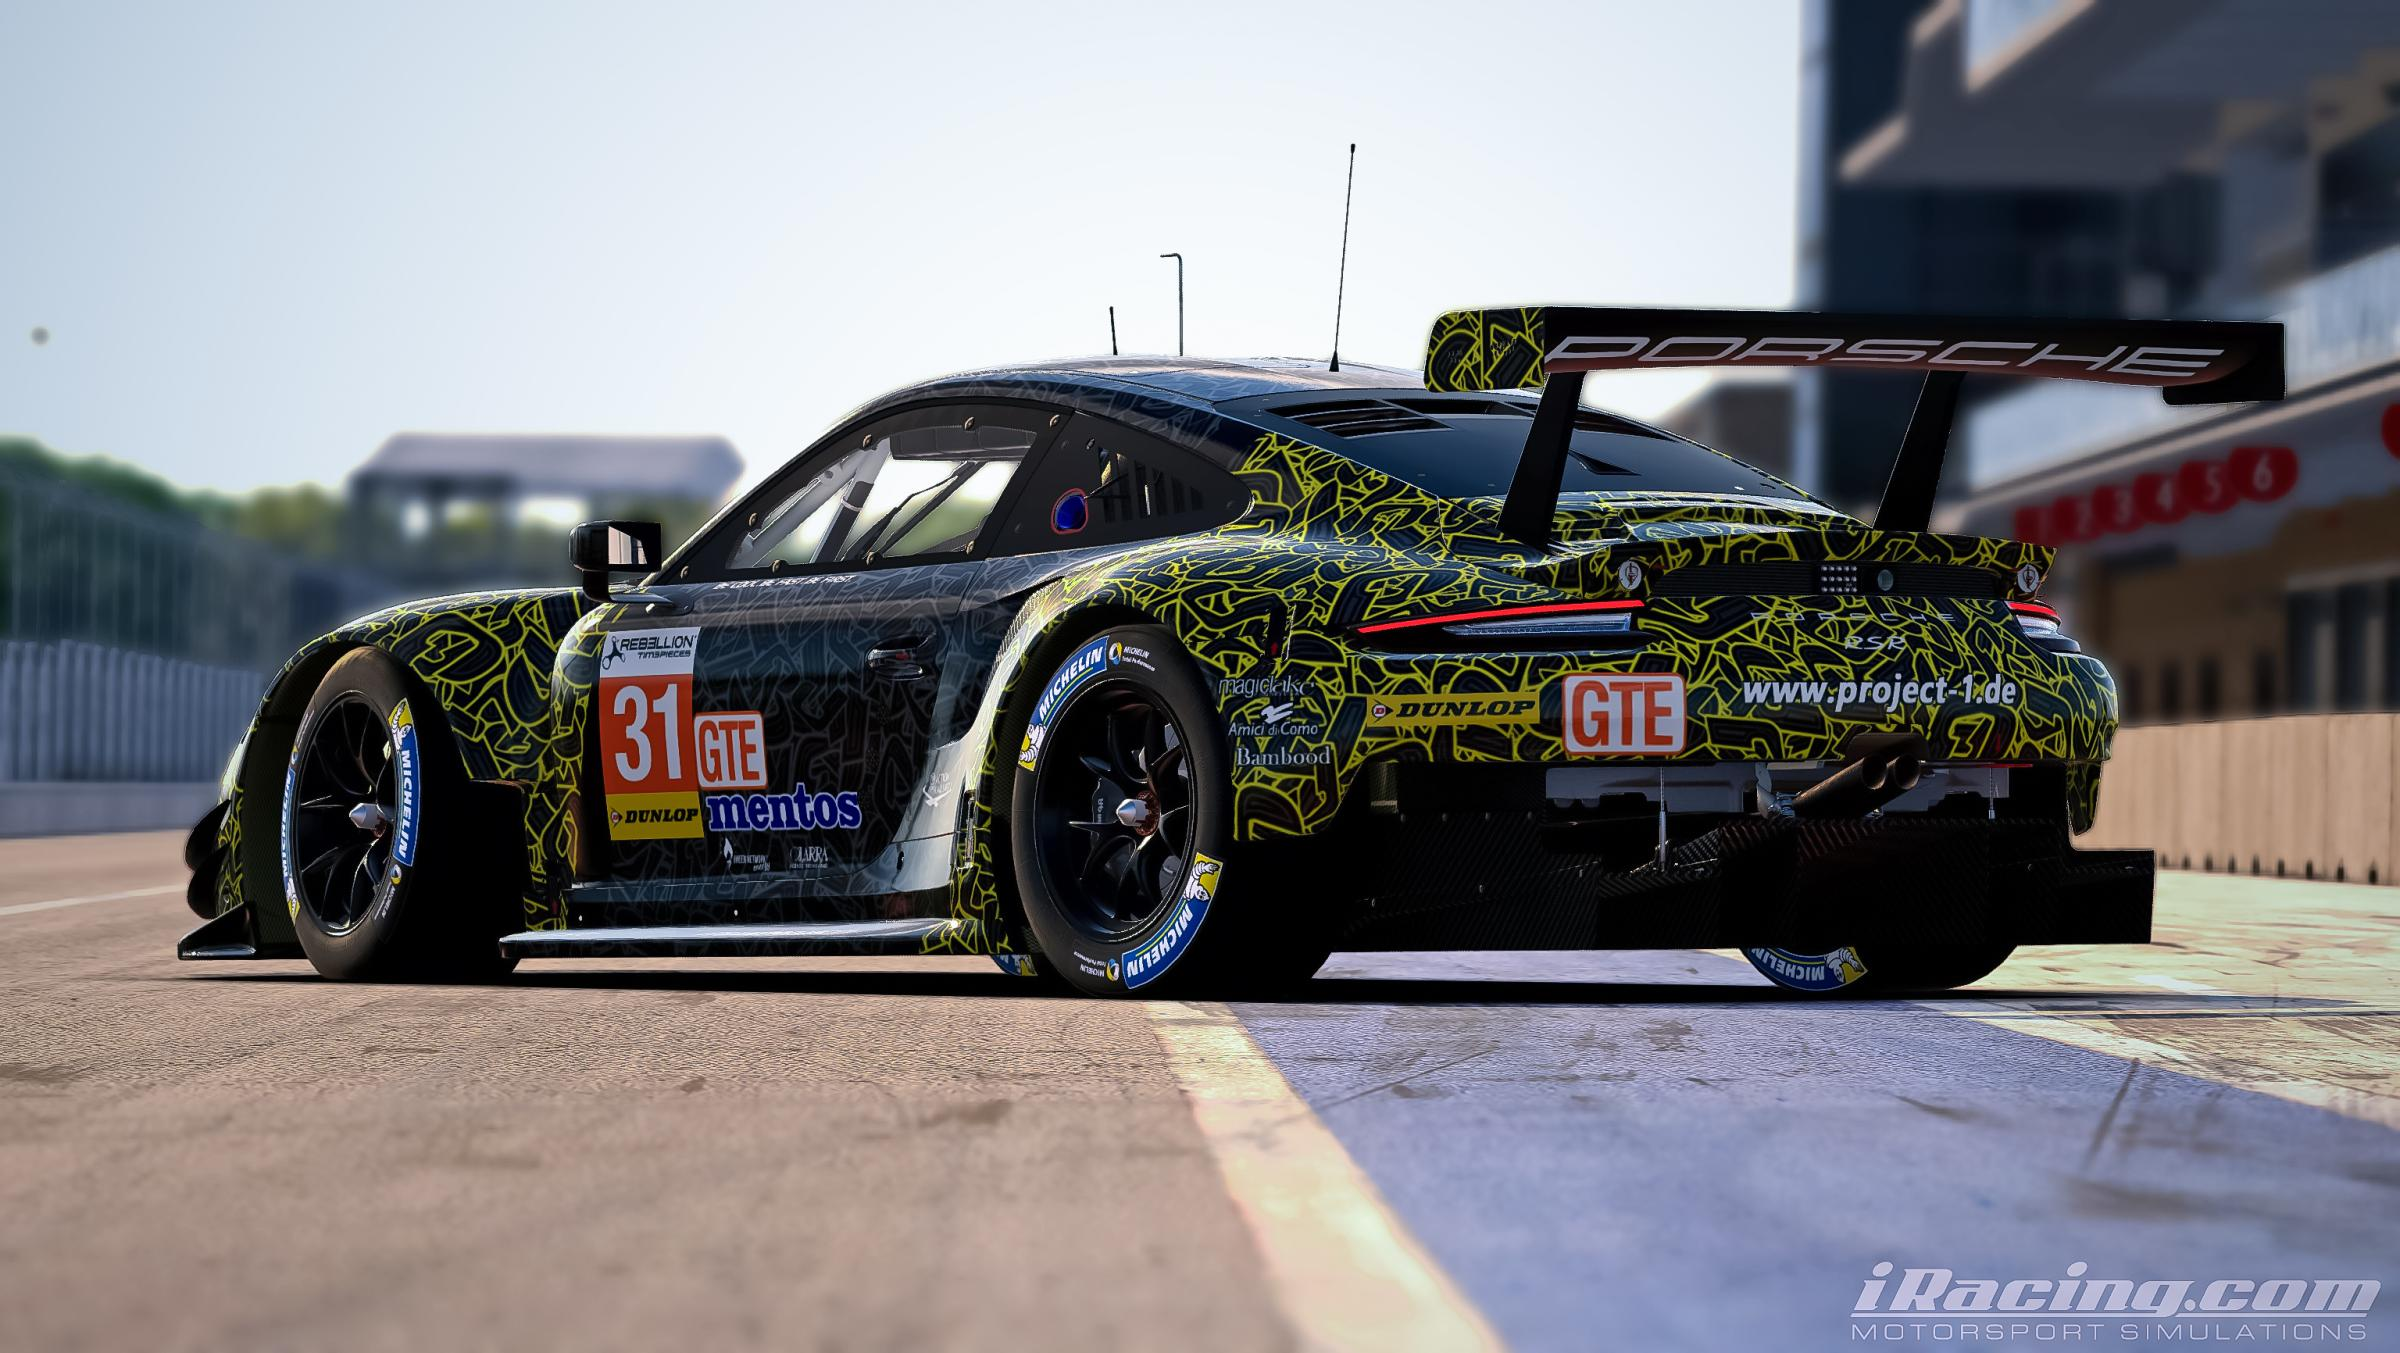 Preview of Project1 #56 Porsche 911RSR by Yuji Asakawa